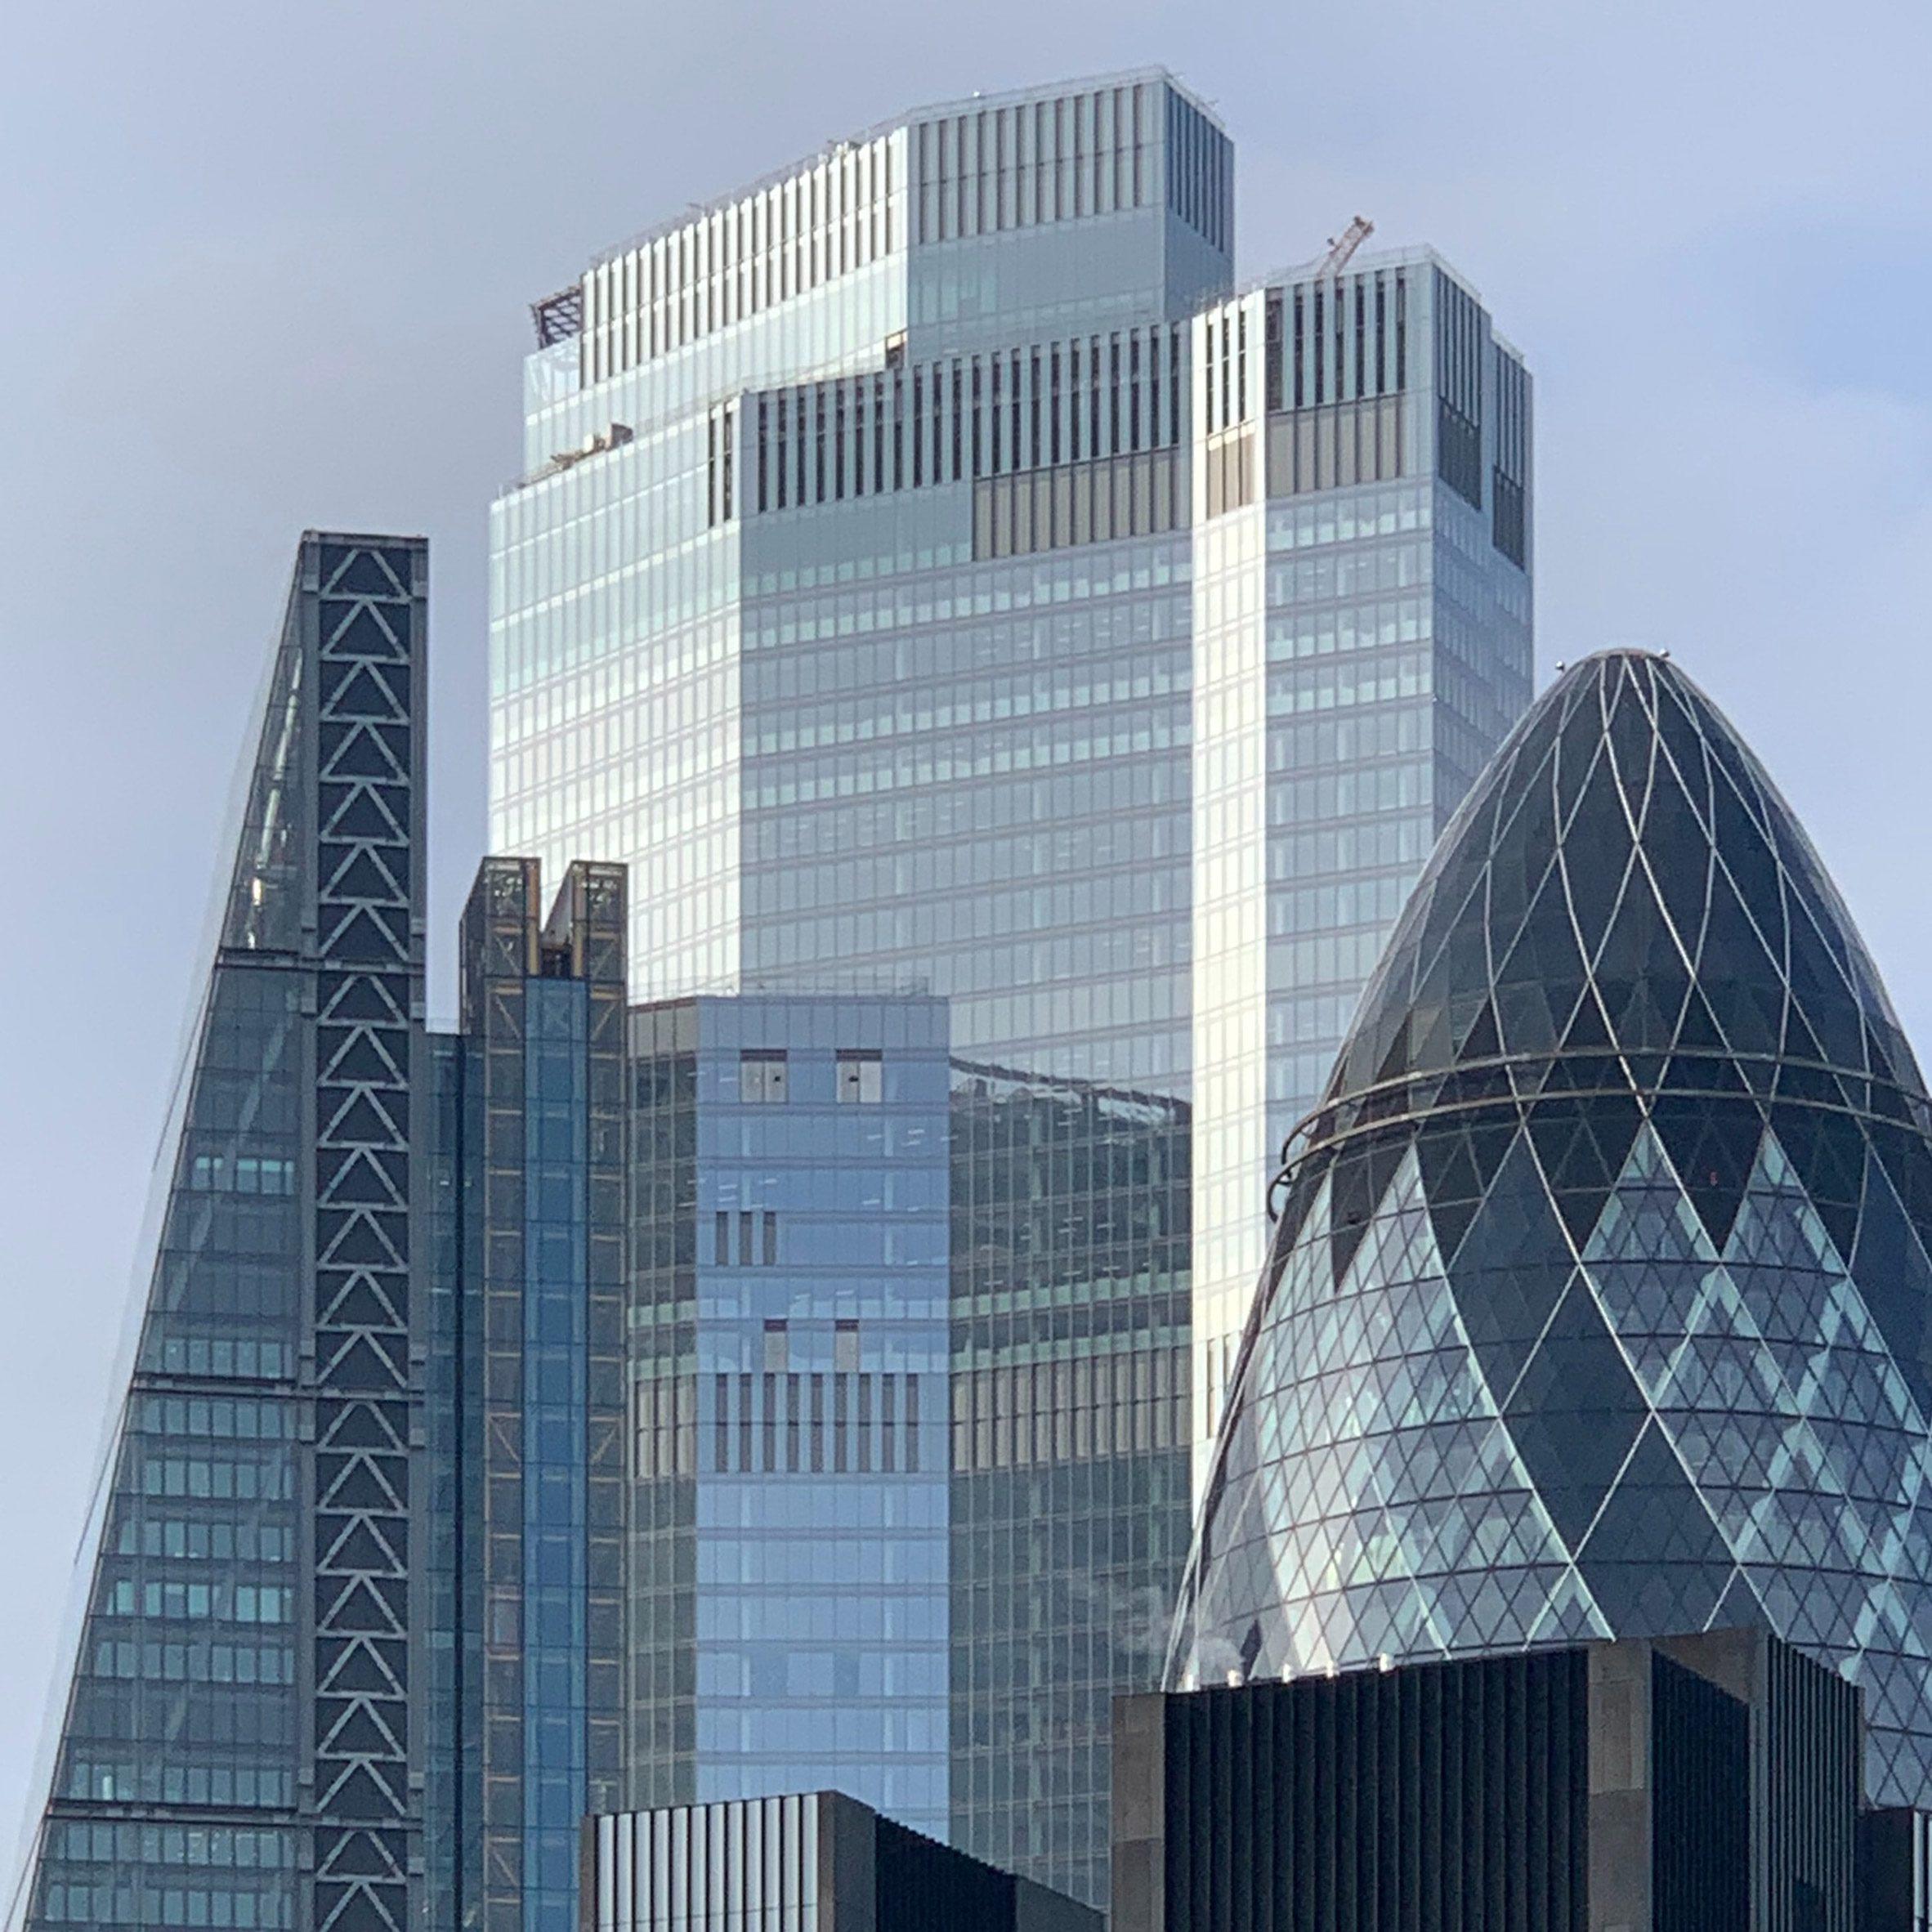 Glass skyscrapers in London